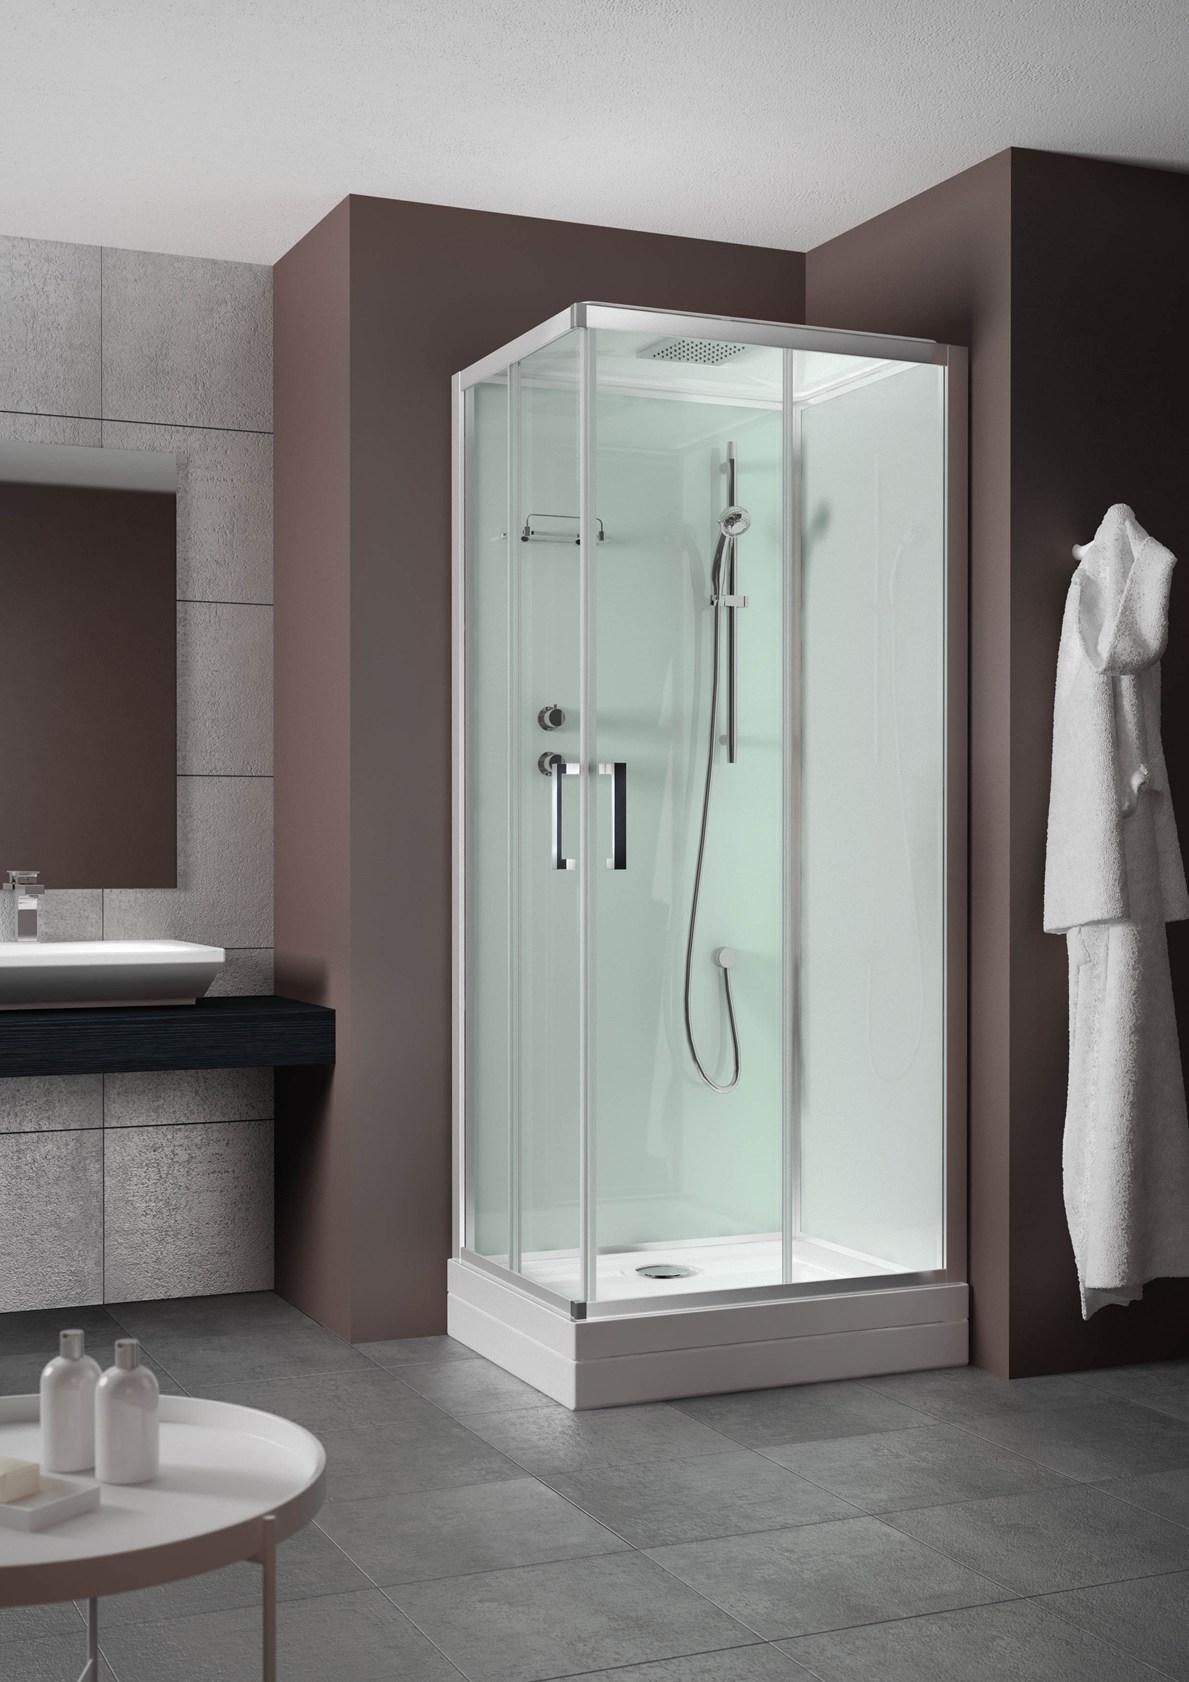 Grandform evobasic cabina doccia 70x90 reversibile for Cabina doccia eklis montaggio